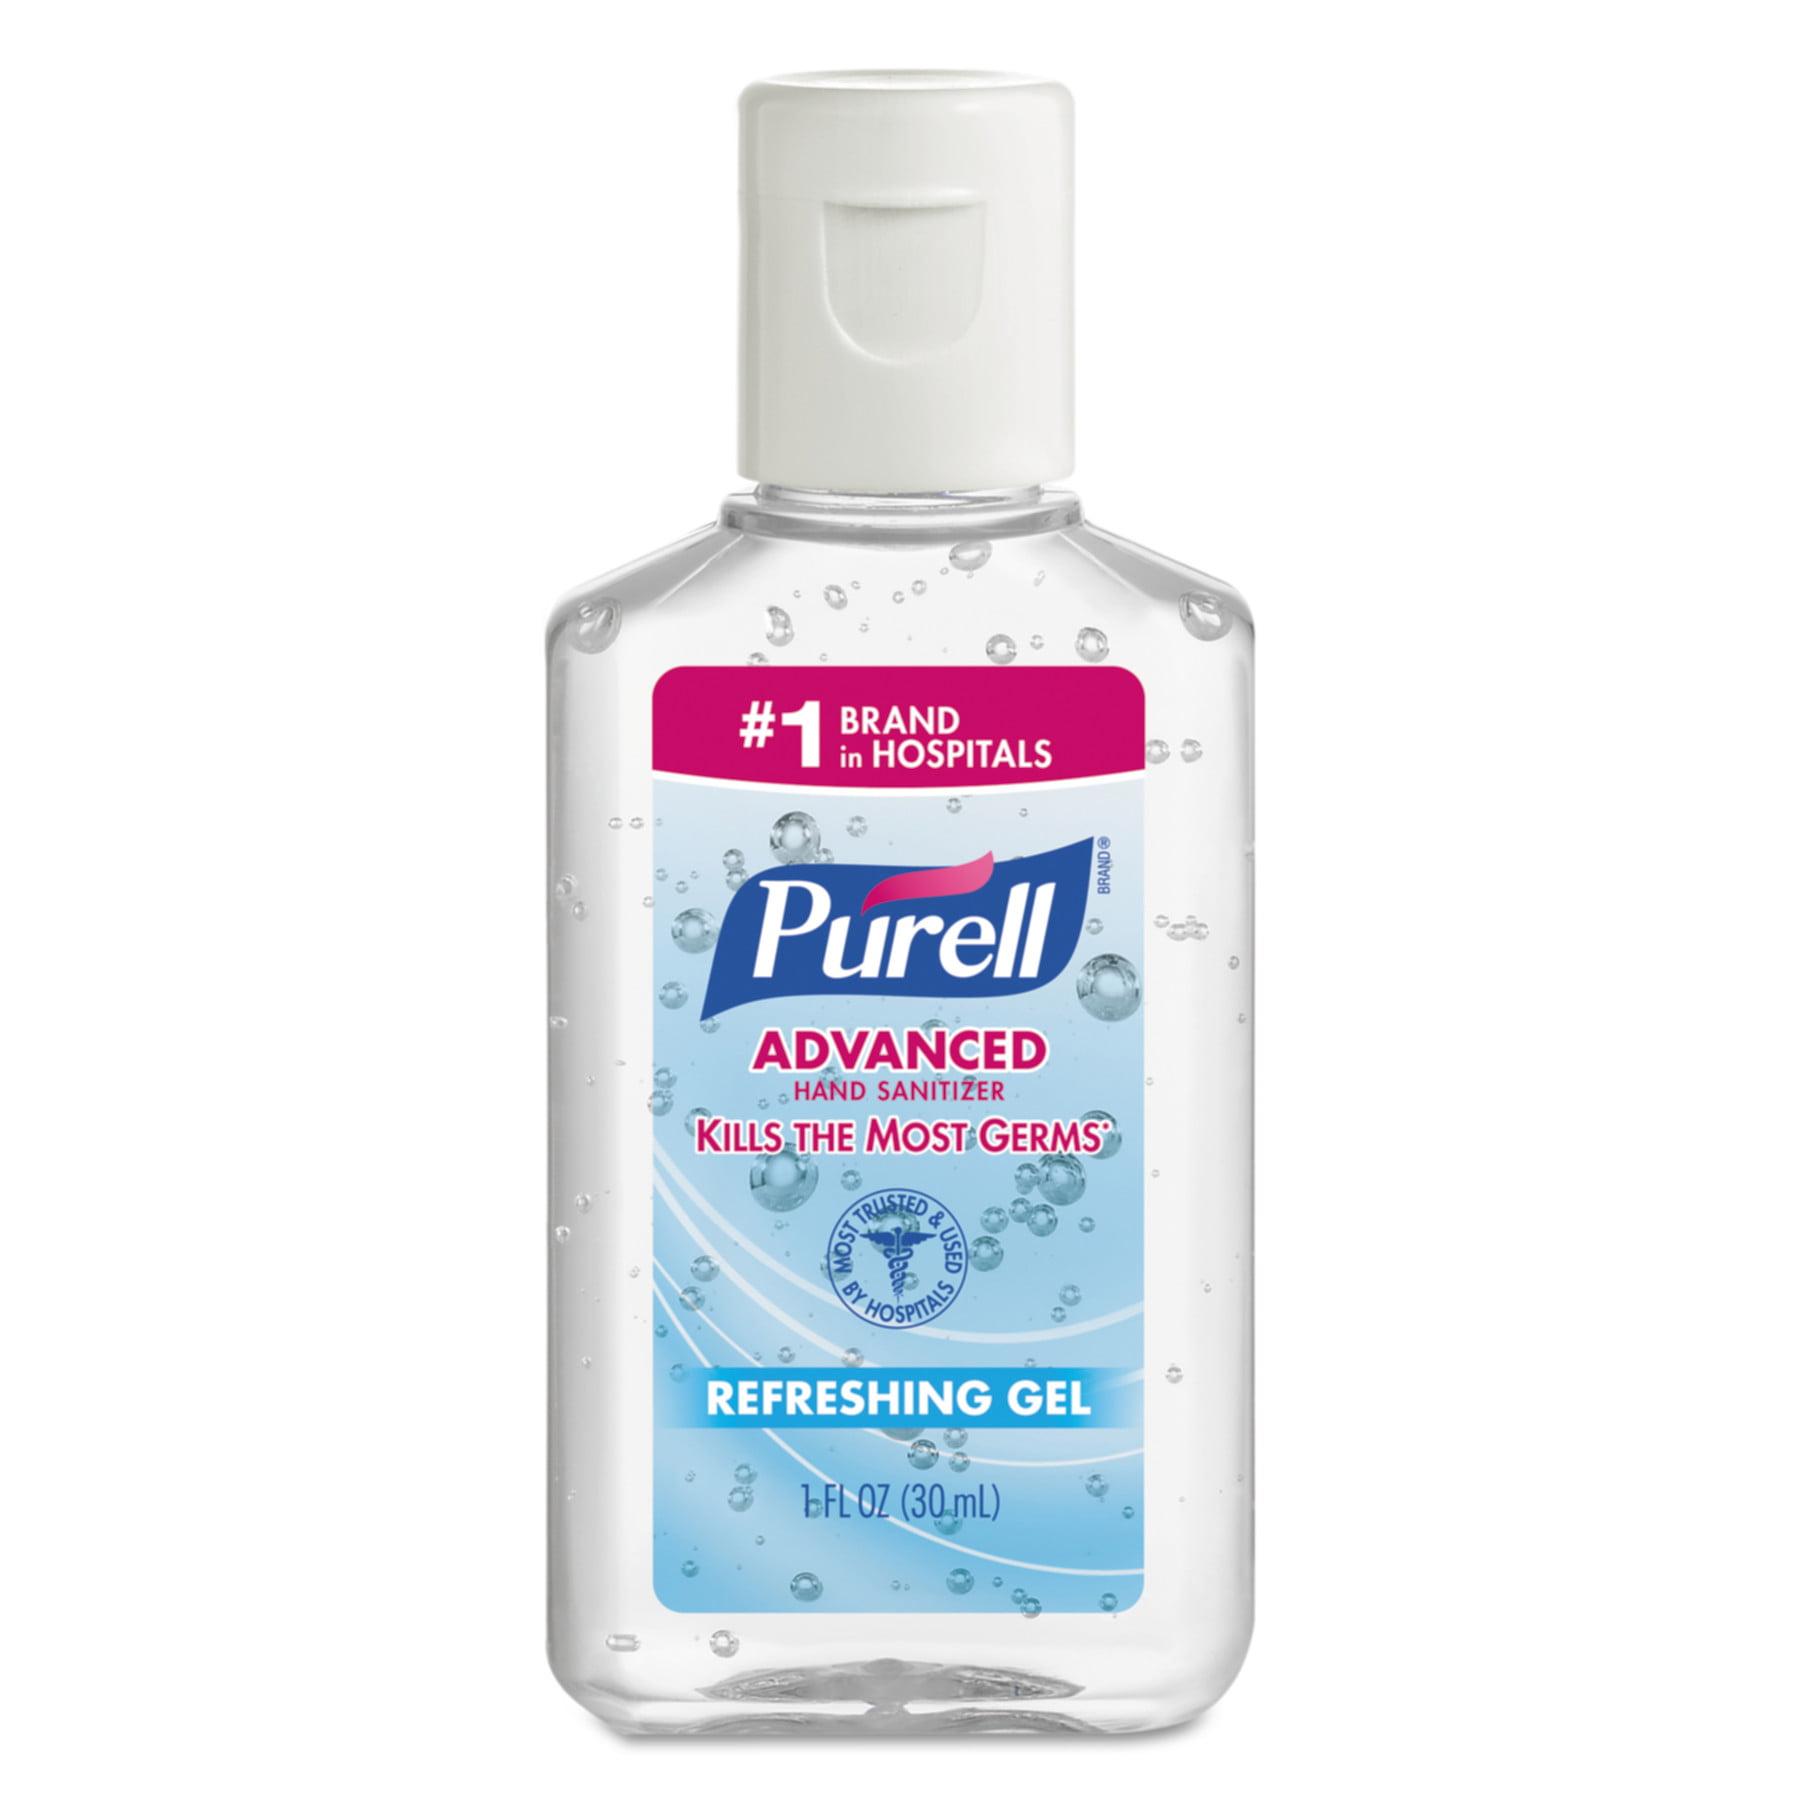 Purell Advanced Instant Hand Sanitizer Gel 1 Oz Bottle Lemon Scent 36 Bowl 1 Bowl Ct Walmart Com Walmart Com